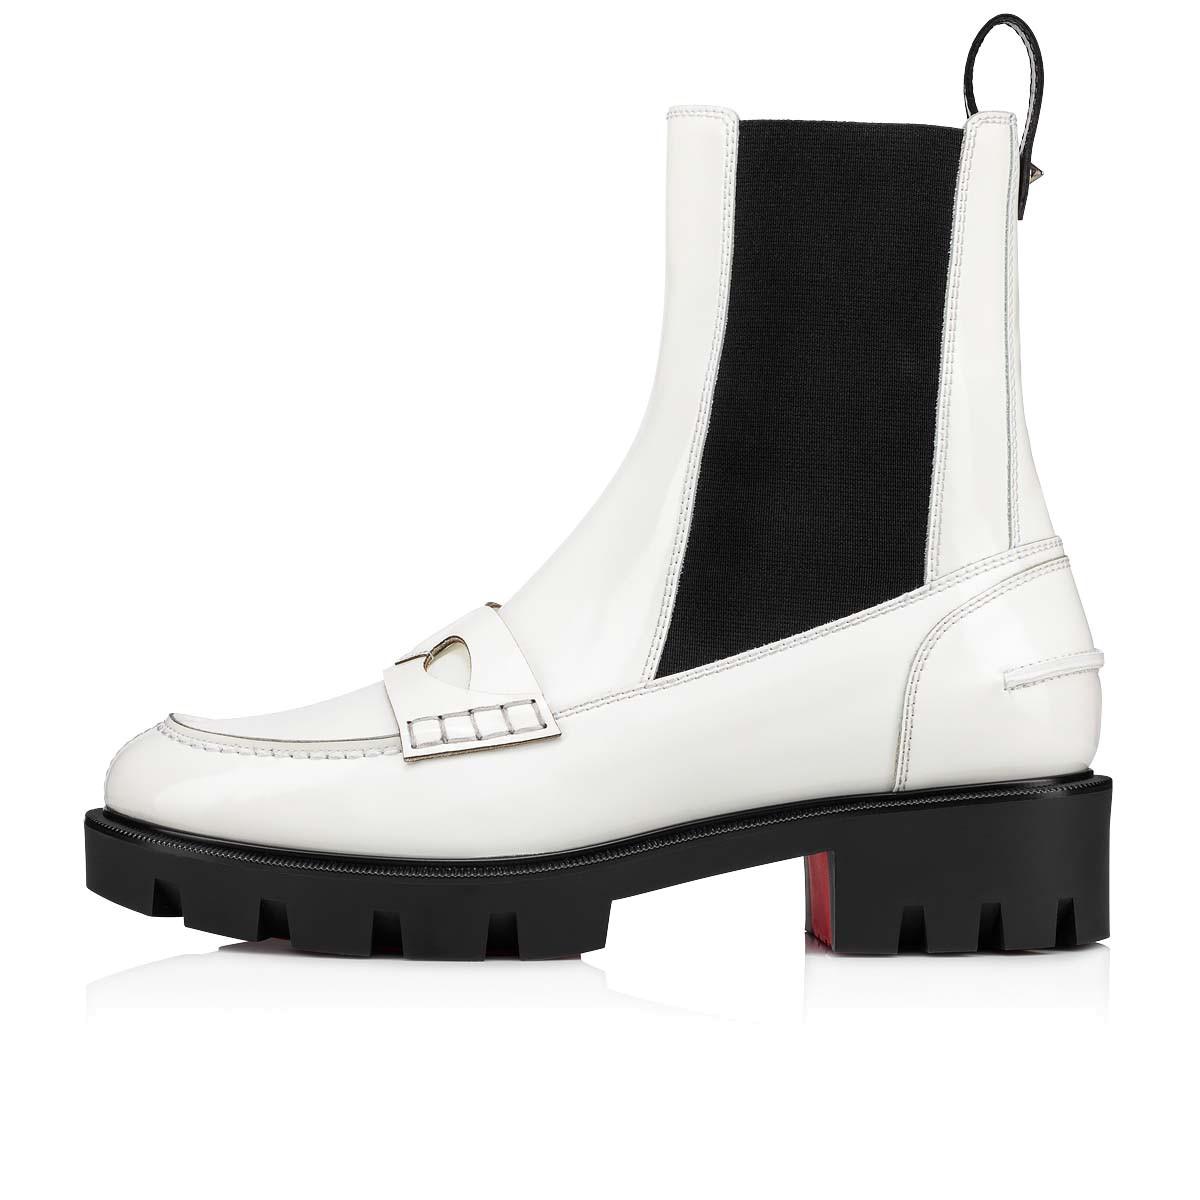 Shoes - Montezu Lug Flat - Christian Louboutin